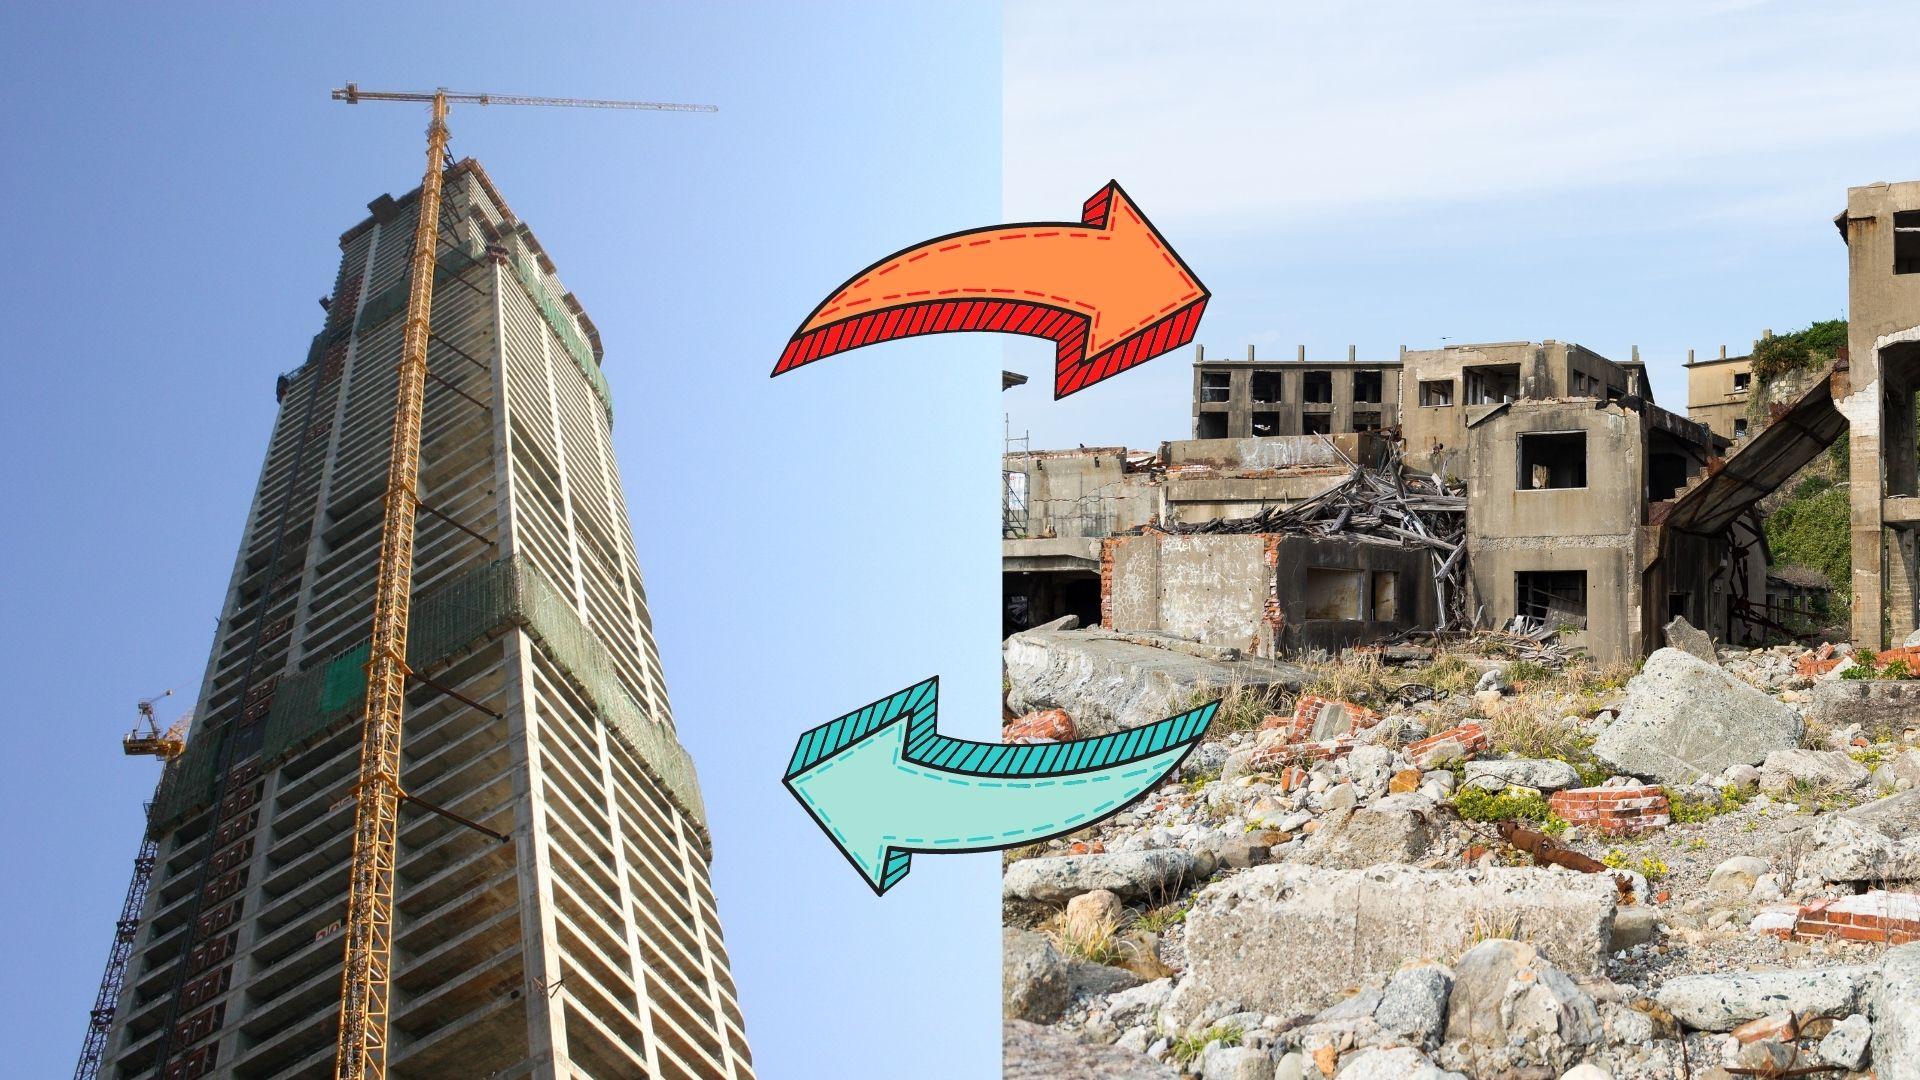 gradnja ali podiranje